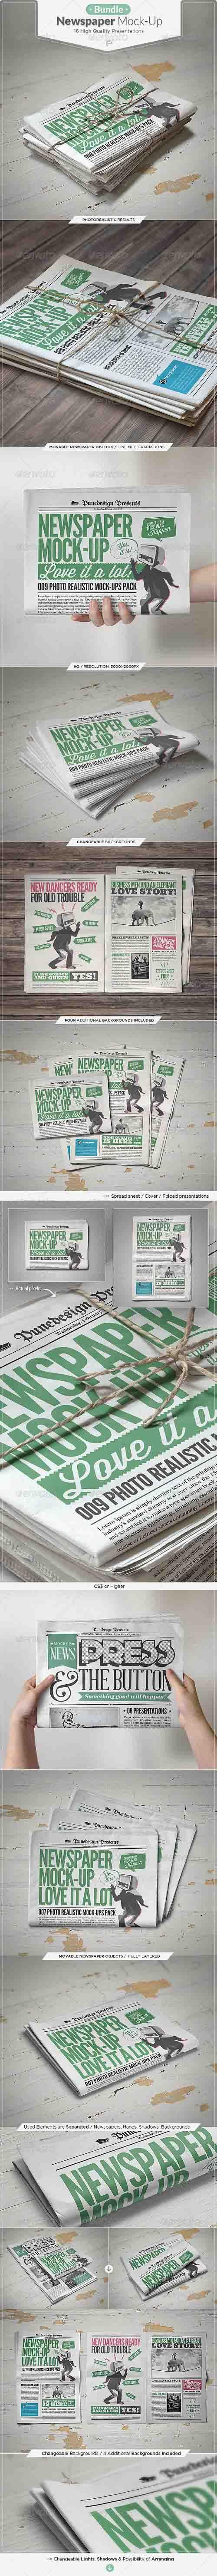 HeroGfx – Newspaper Mock-up Bundle » Free Special GFX Posts Vectors AEP Projects PSD Web Templates | HeroGFX.com